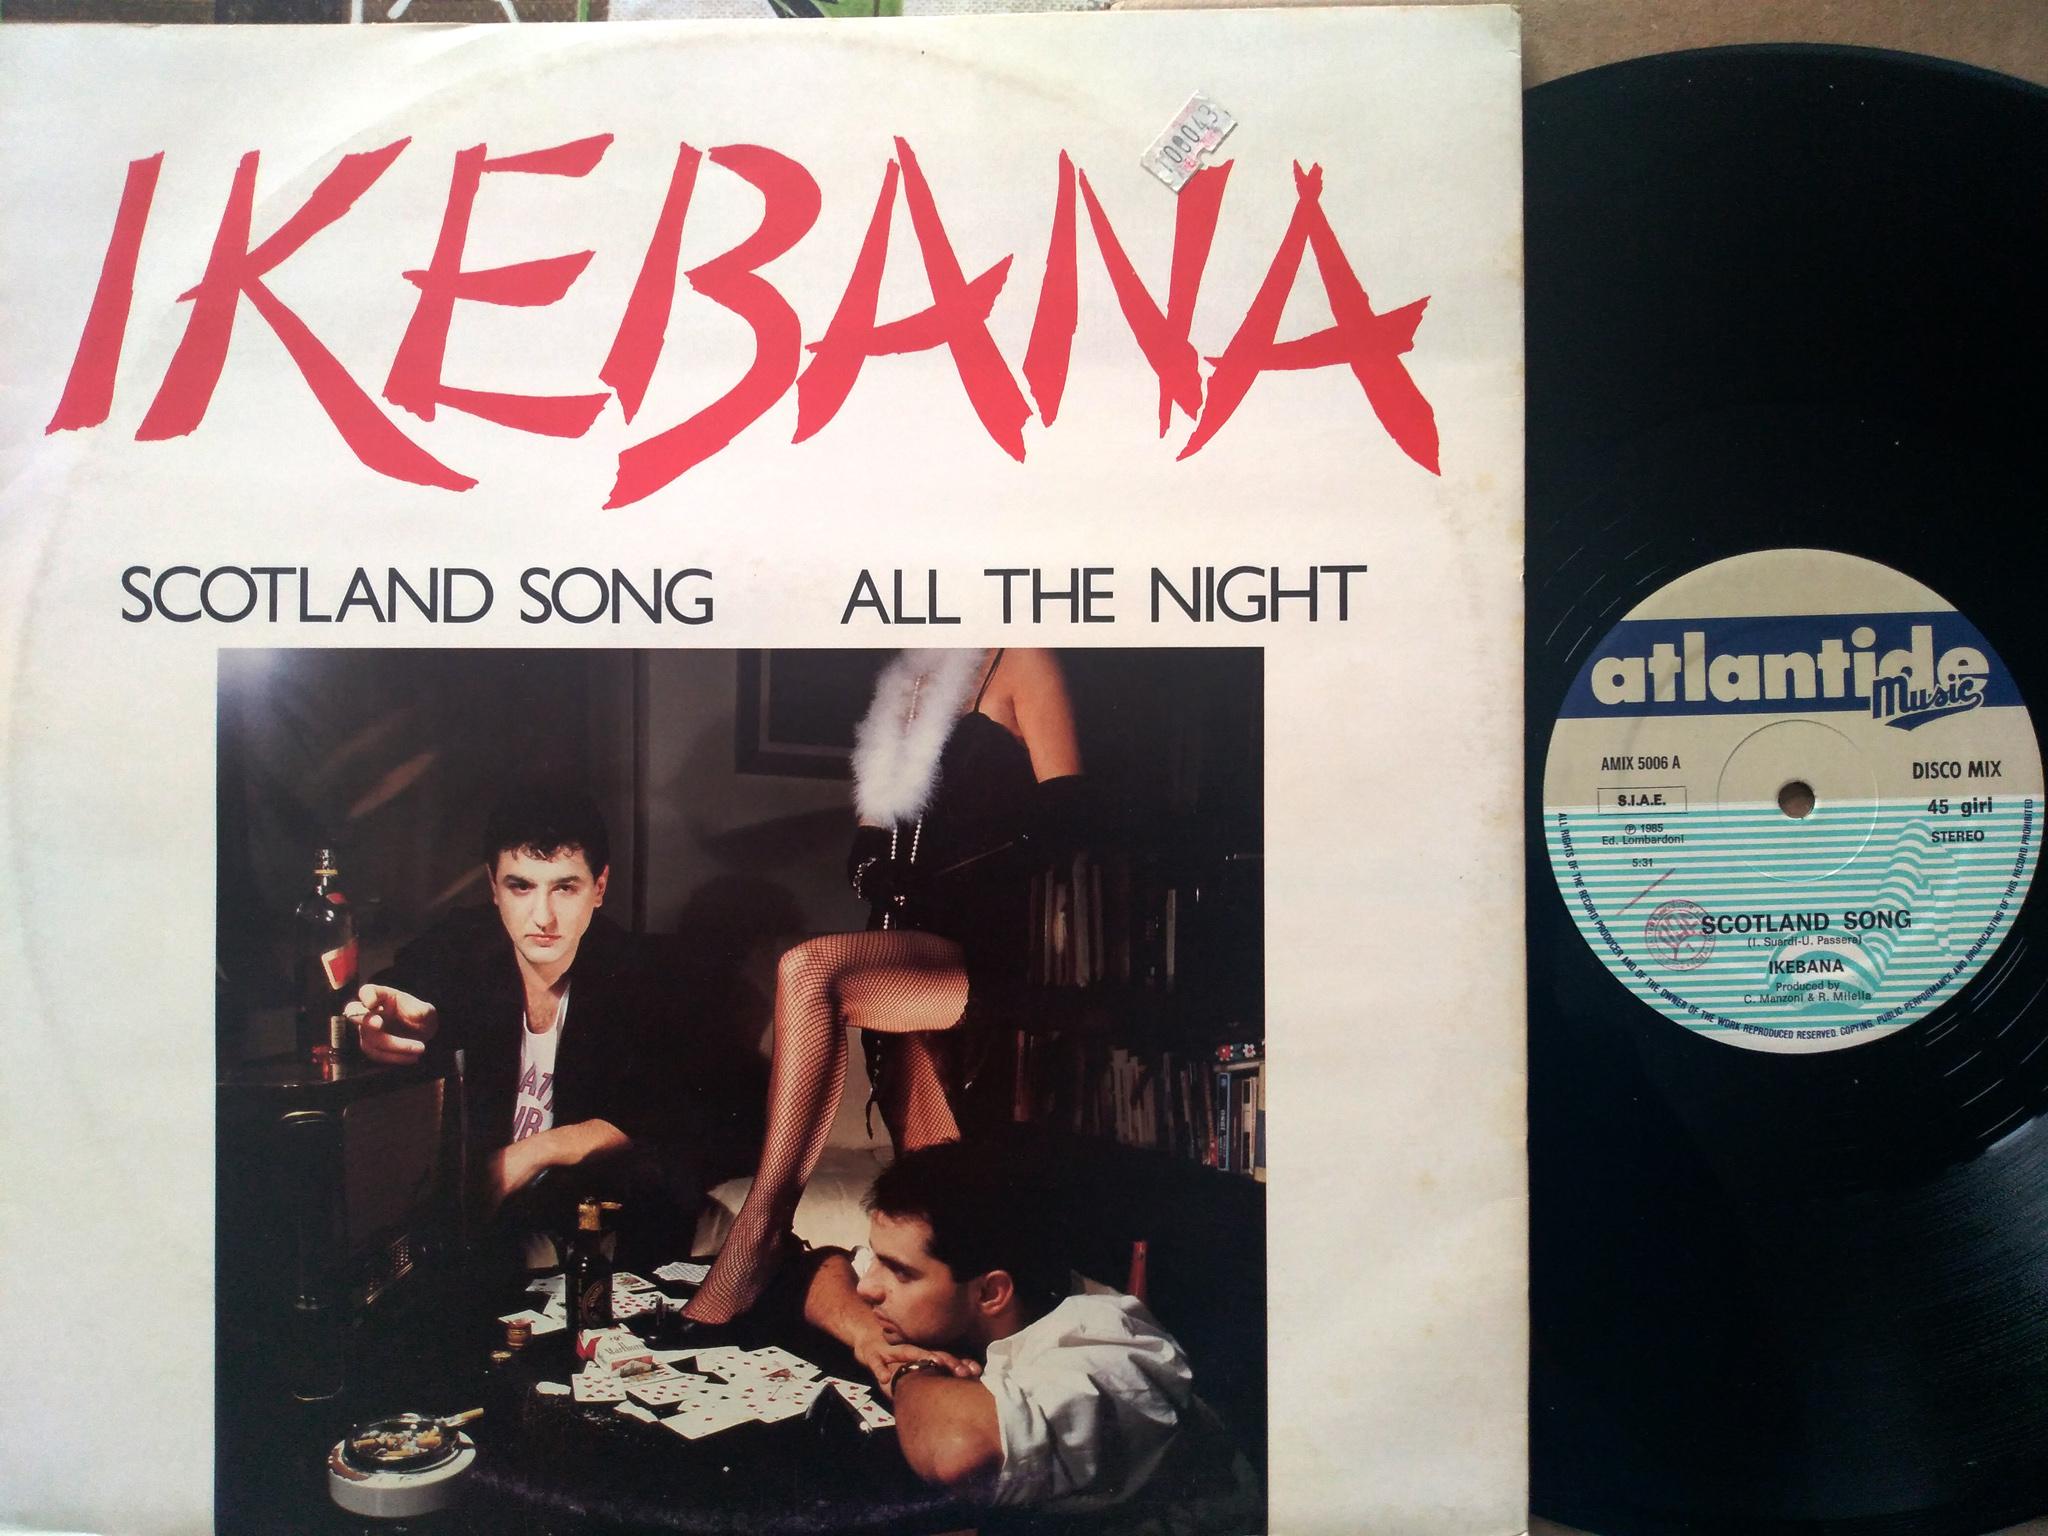 Ikebana - Scotland Song